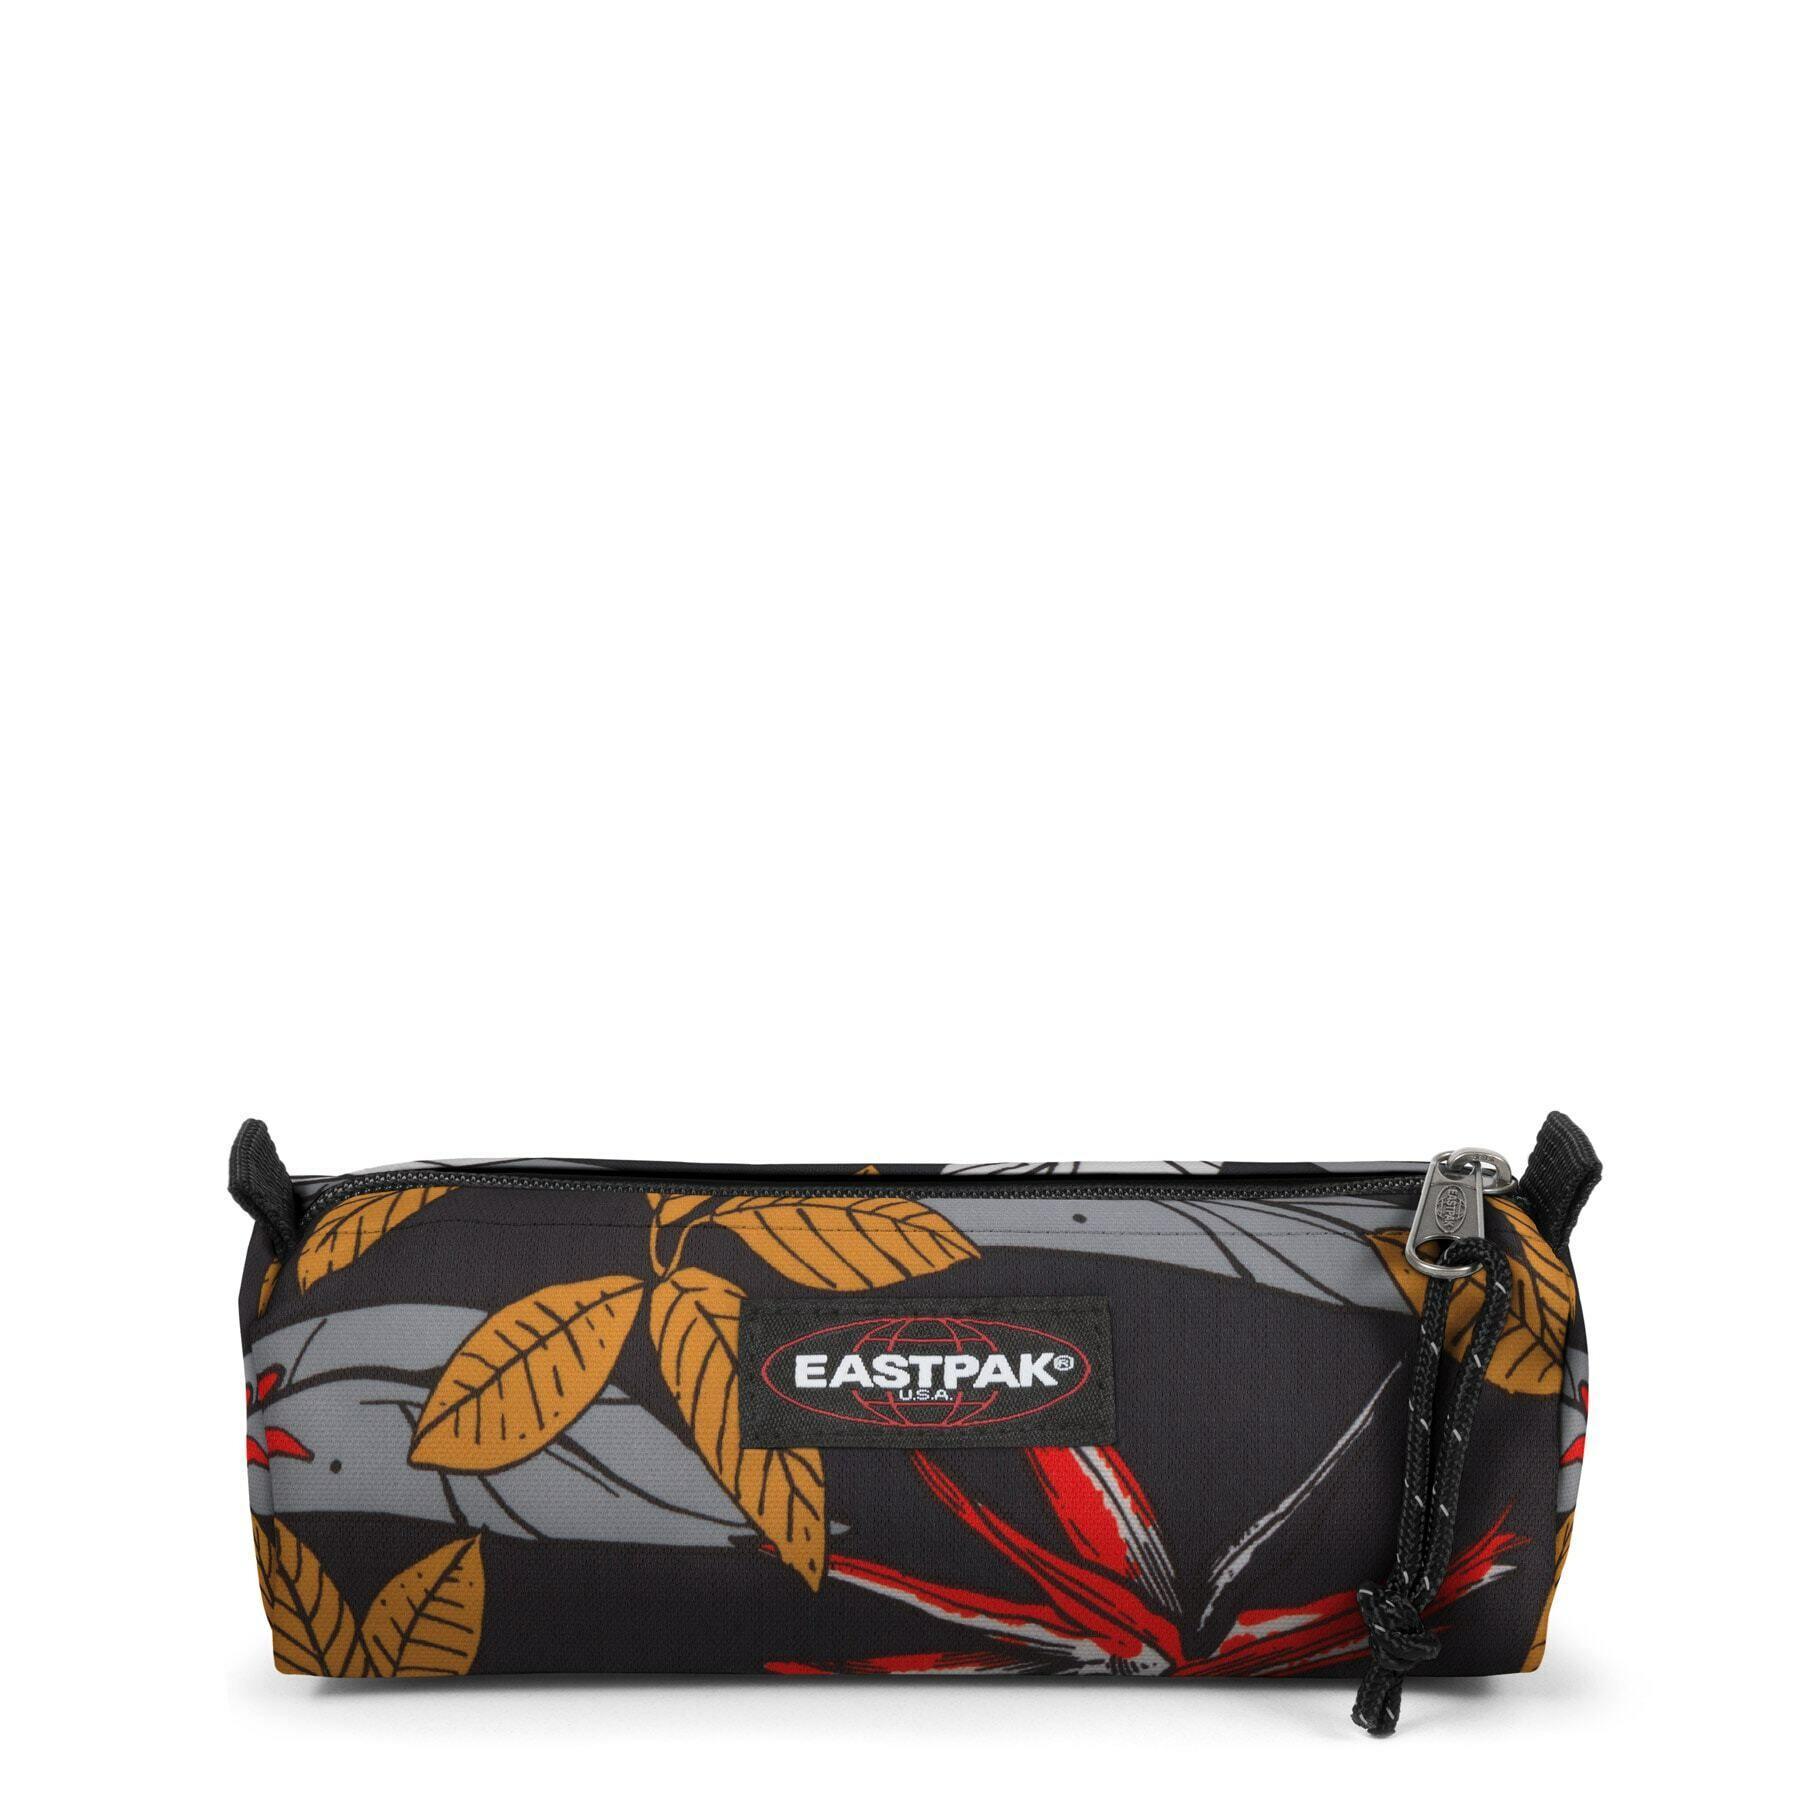 Kit Eastpak Benchmark Single